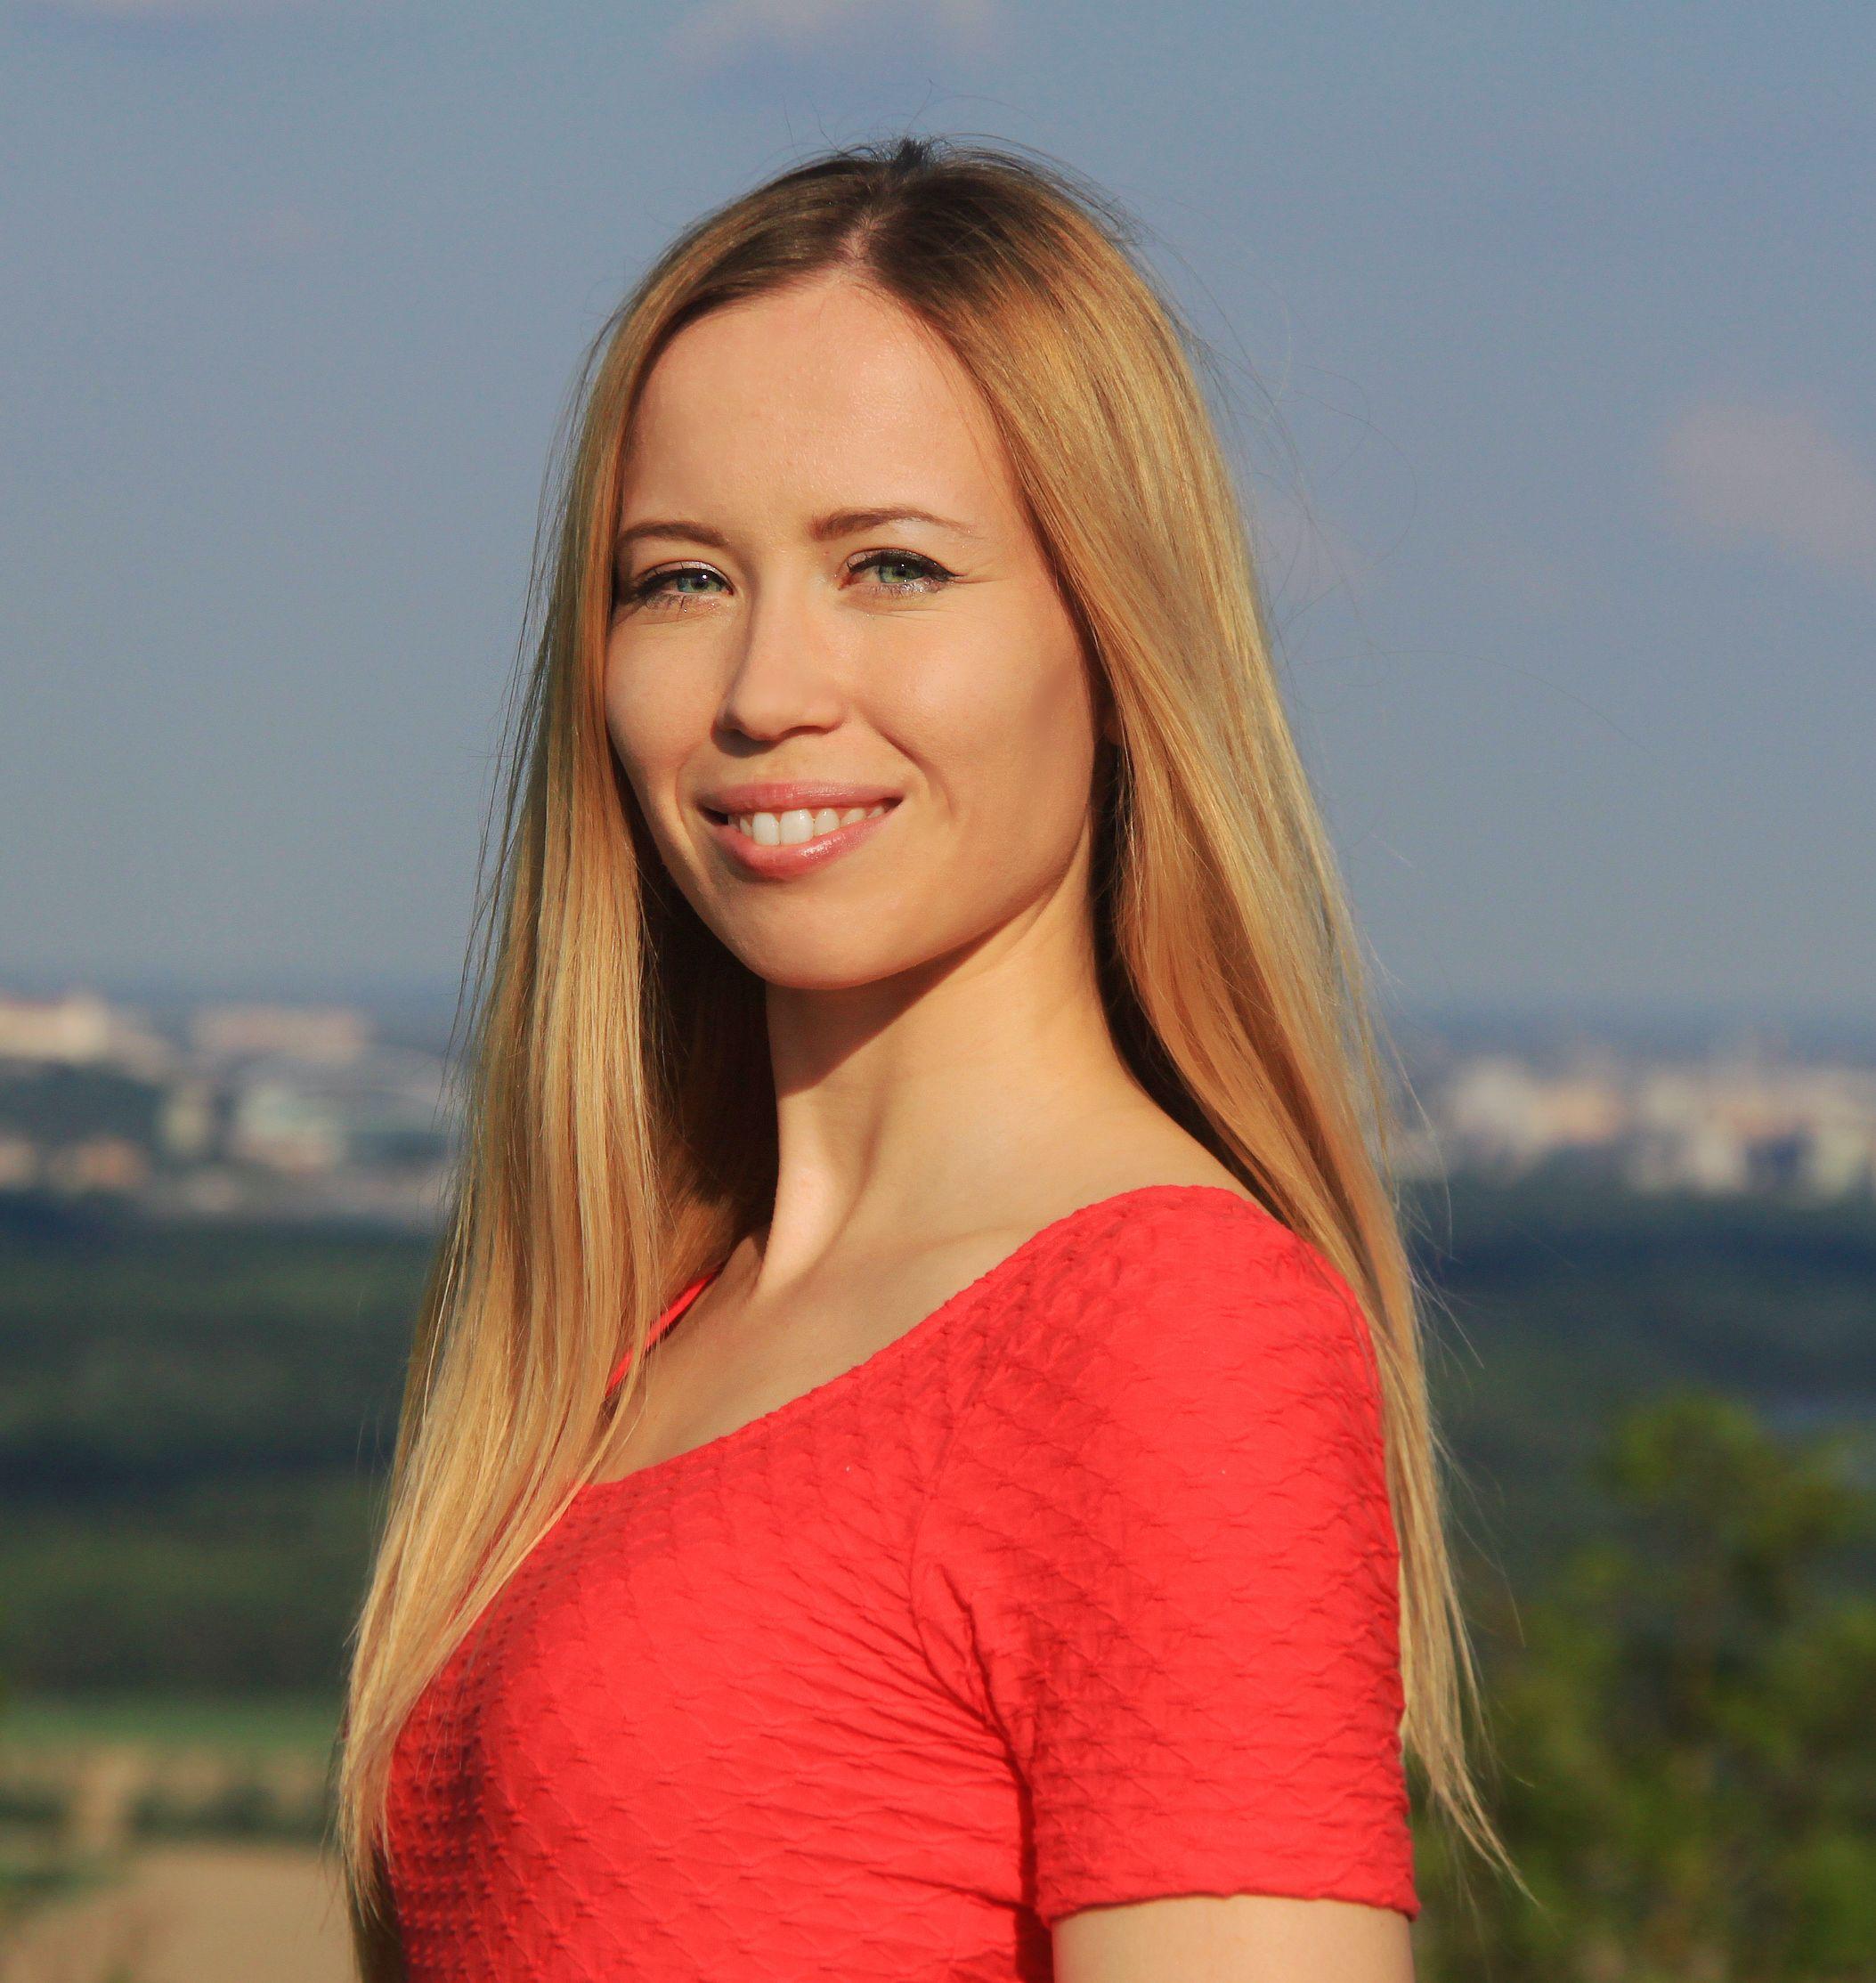 ivana_mesarosova.jpg